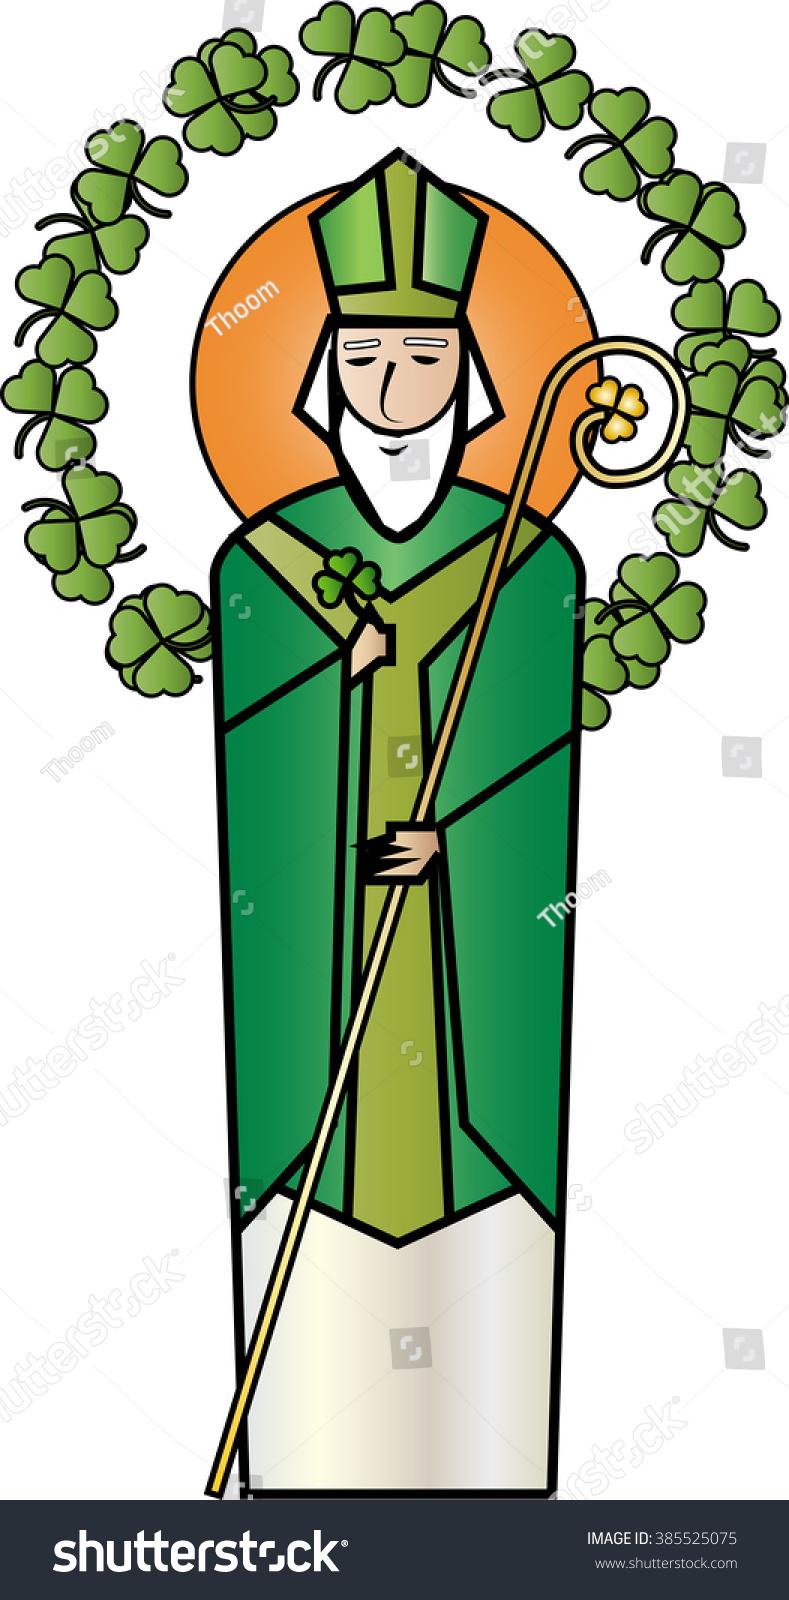 st patrick patron saint ireland simple stock vector 385525075